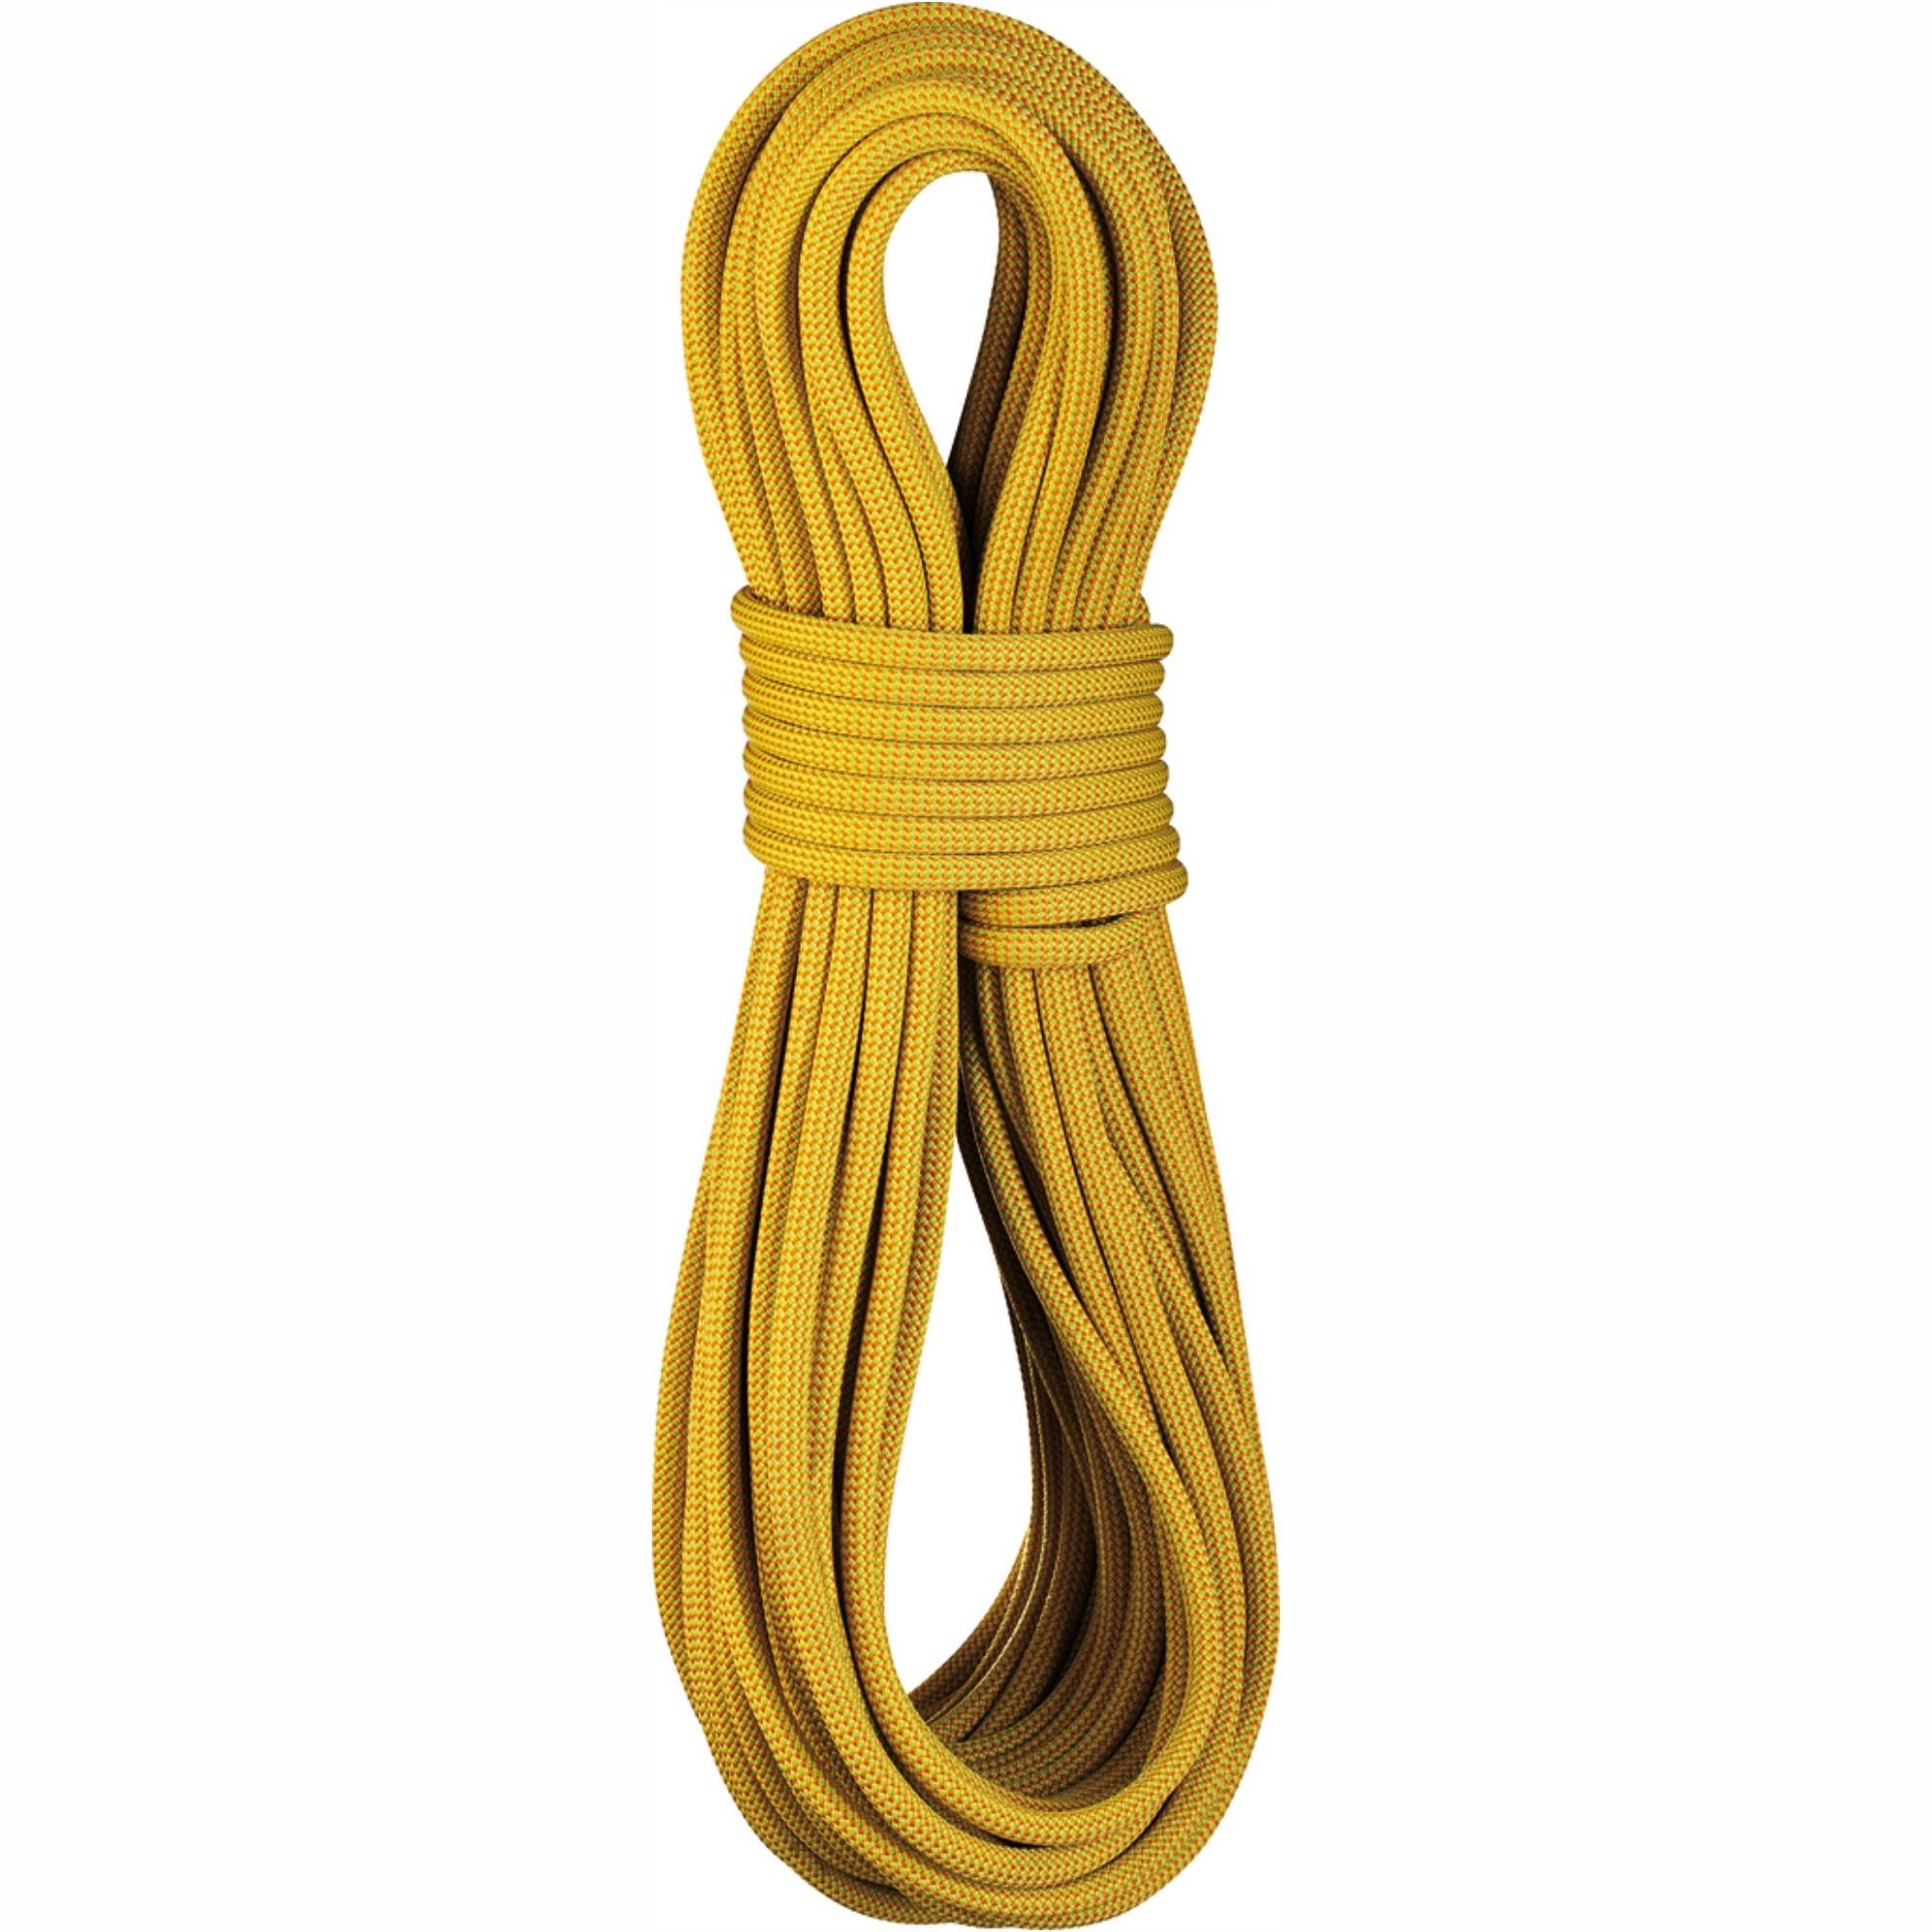 Edelrid Kestrel Pro Dry 8.5mm 50m Half Rope - Flame